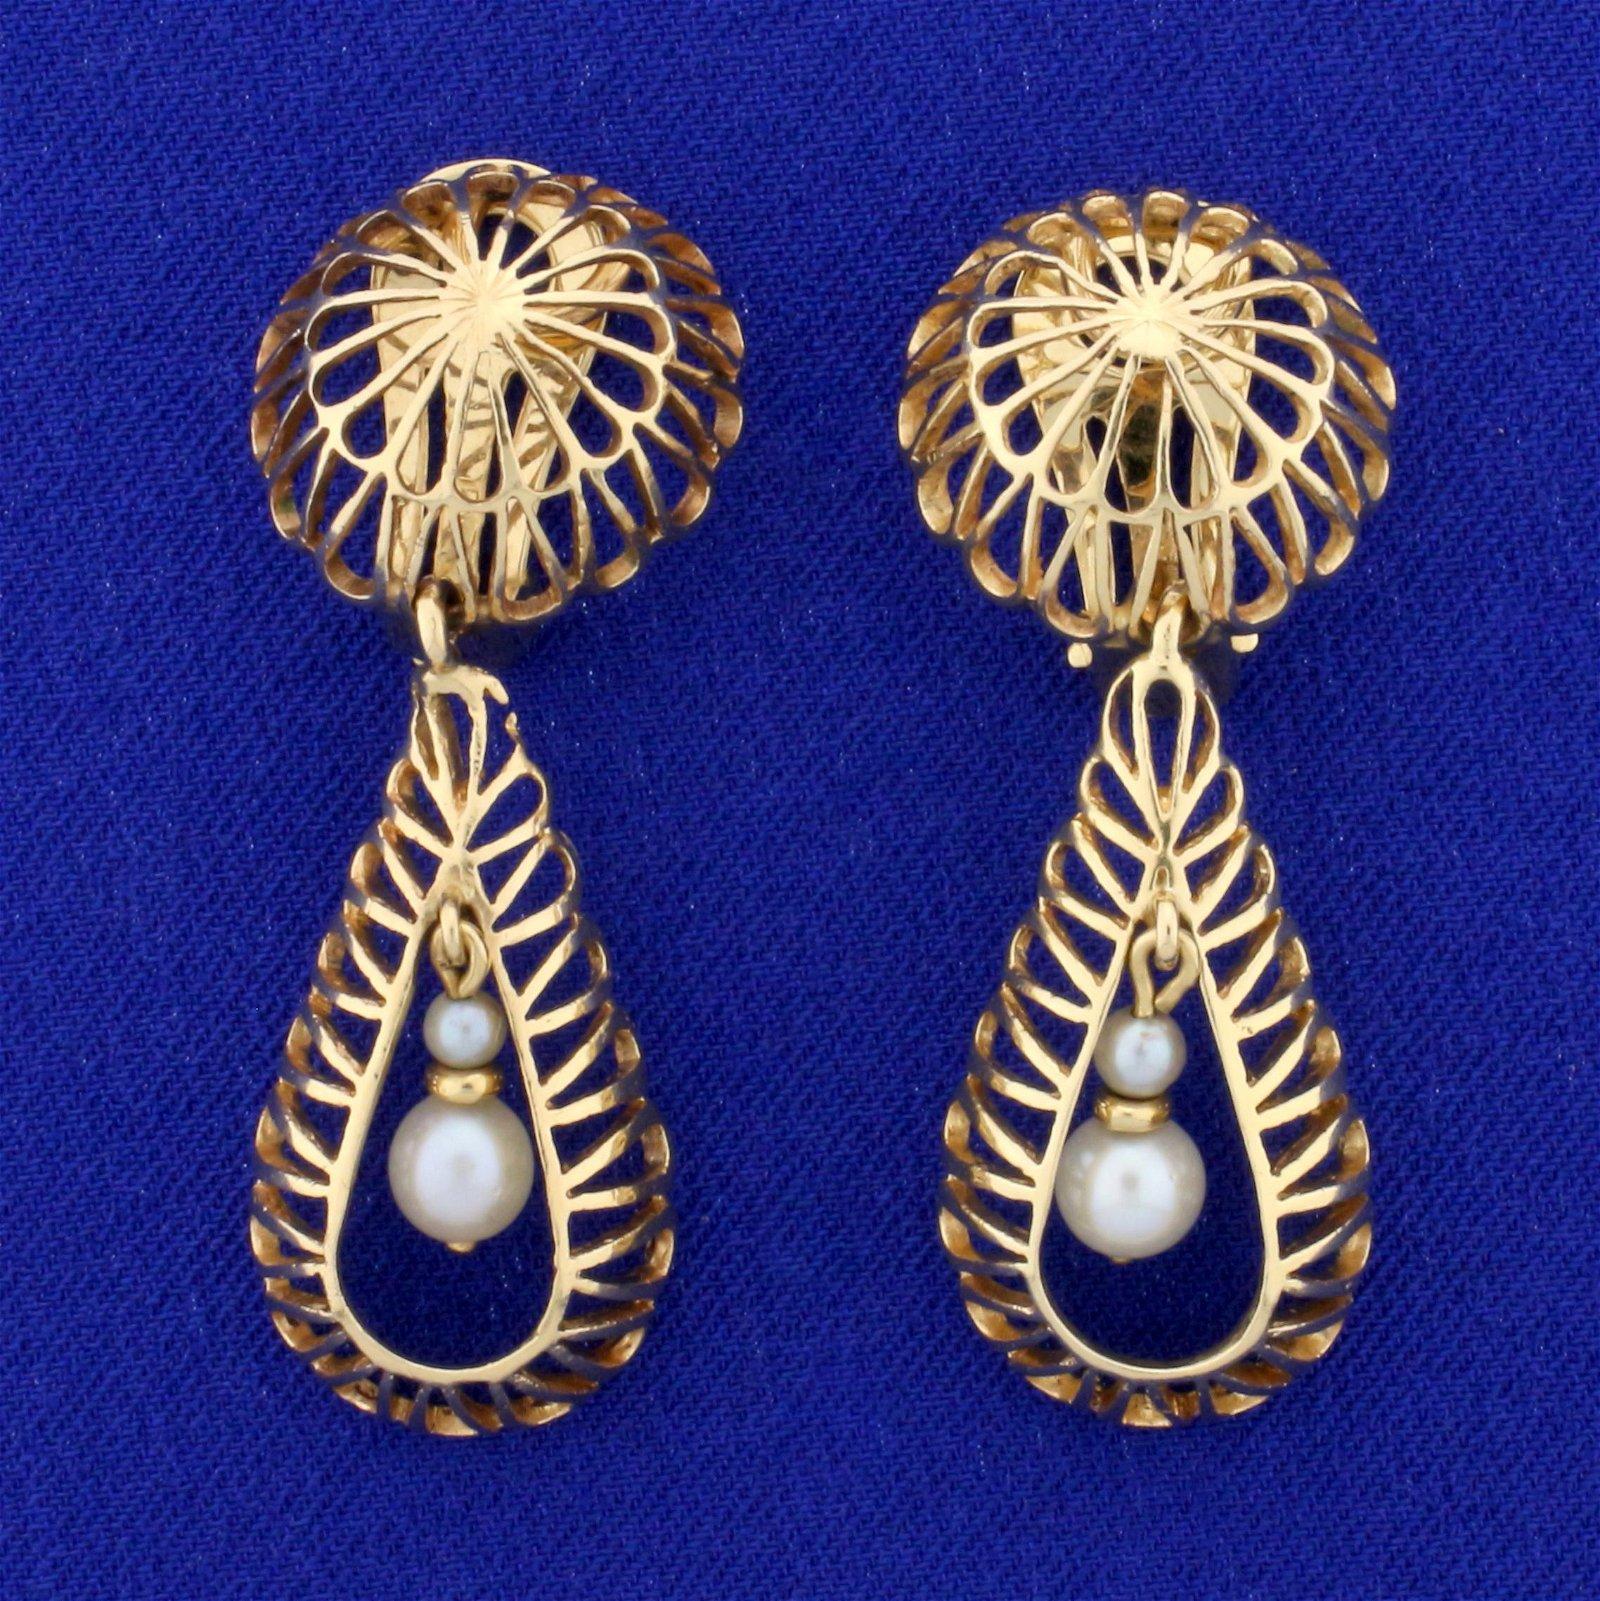 Large Cultured Pearl Dangle Clip-on Earrings in 14K